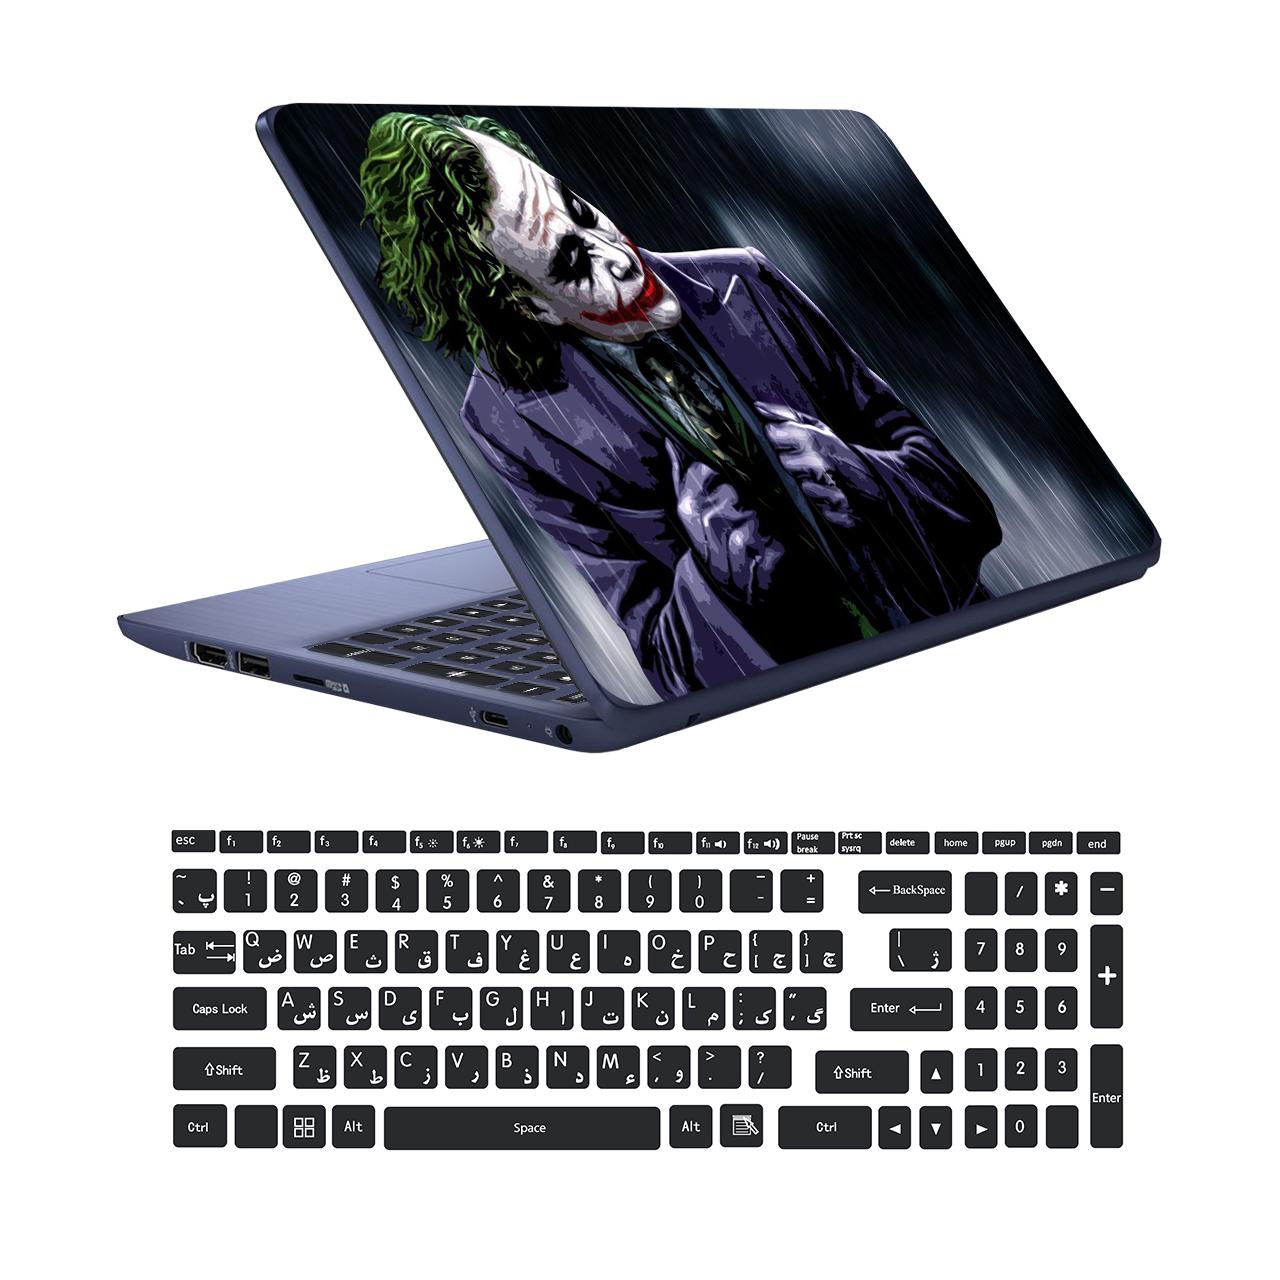 استیکر لپ تاپ کد JK08 به همراه برچسب حروف فارسی کیبورد